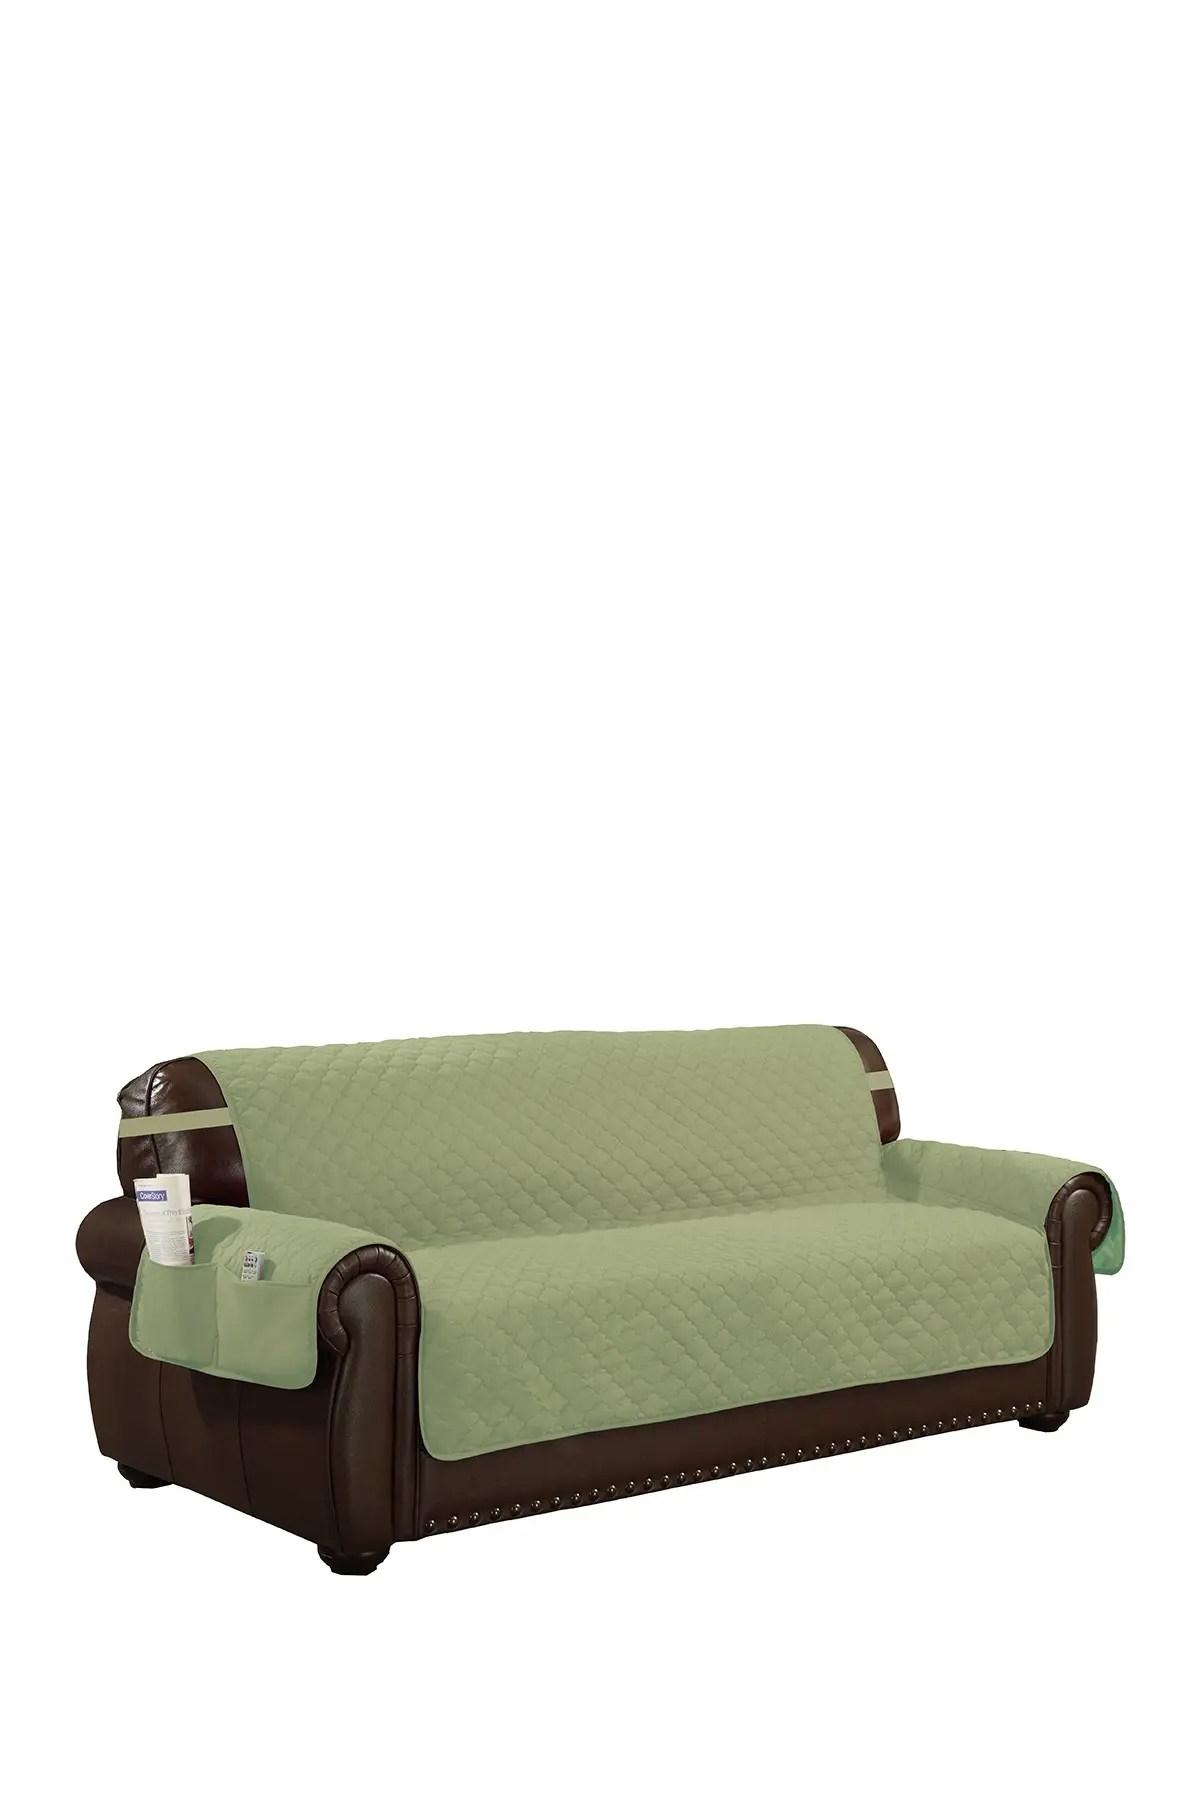 duck river textile sage chocolate jameson reversible waterproof microfiber exrta sofa cover nordstrom rack